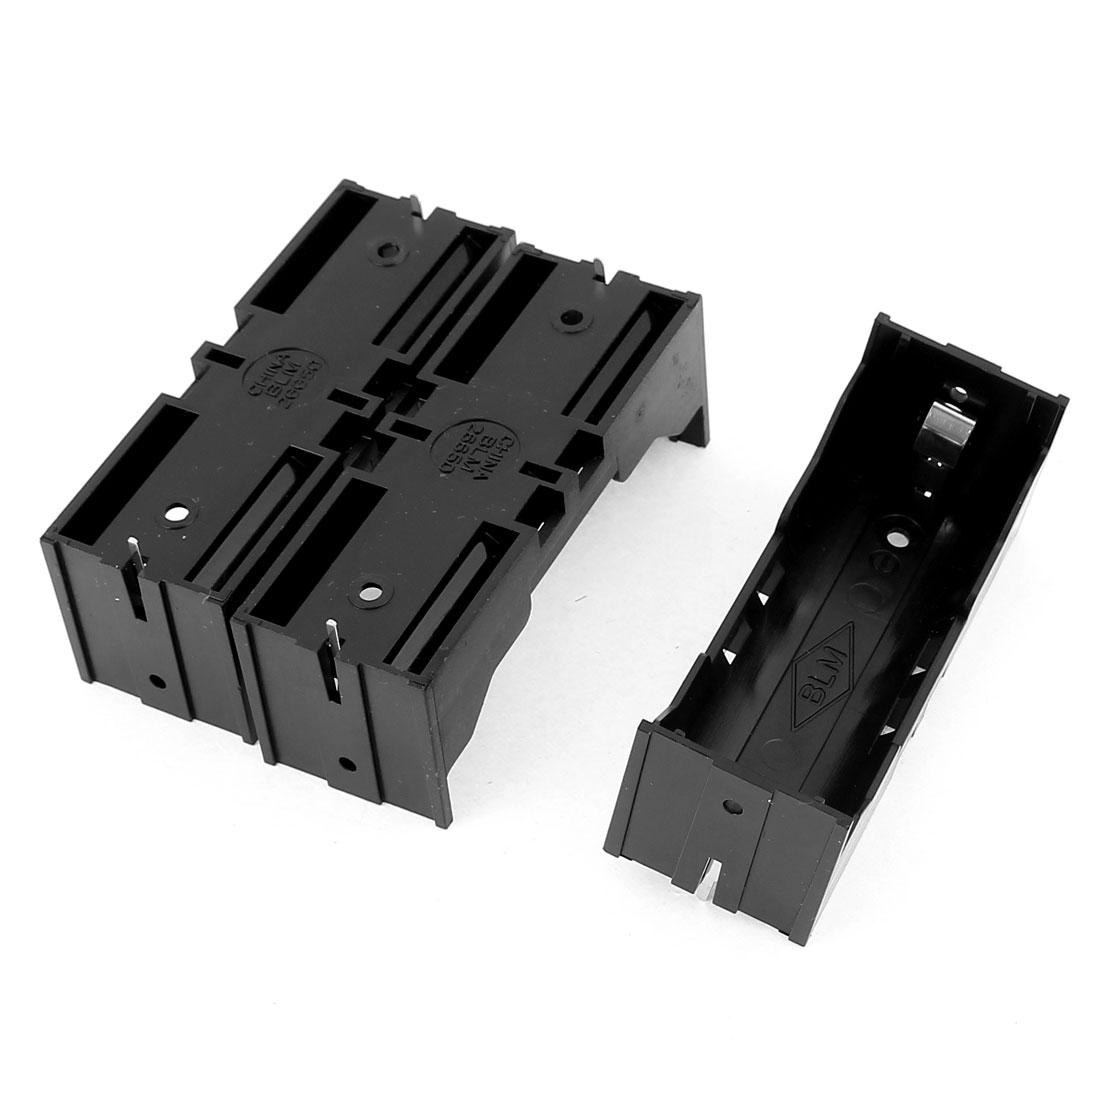 3Pcs Plastic Single 26650 Battery Holder Case Storage Box Black